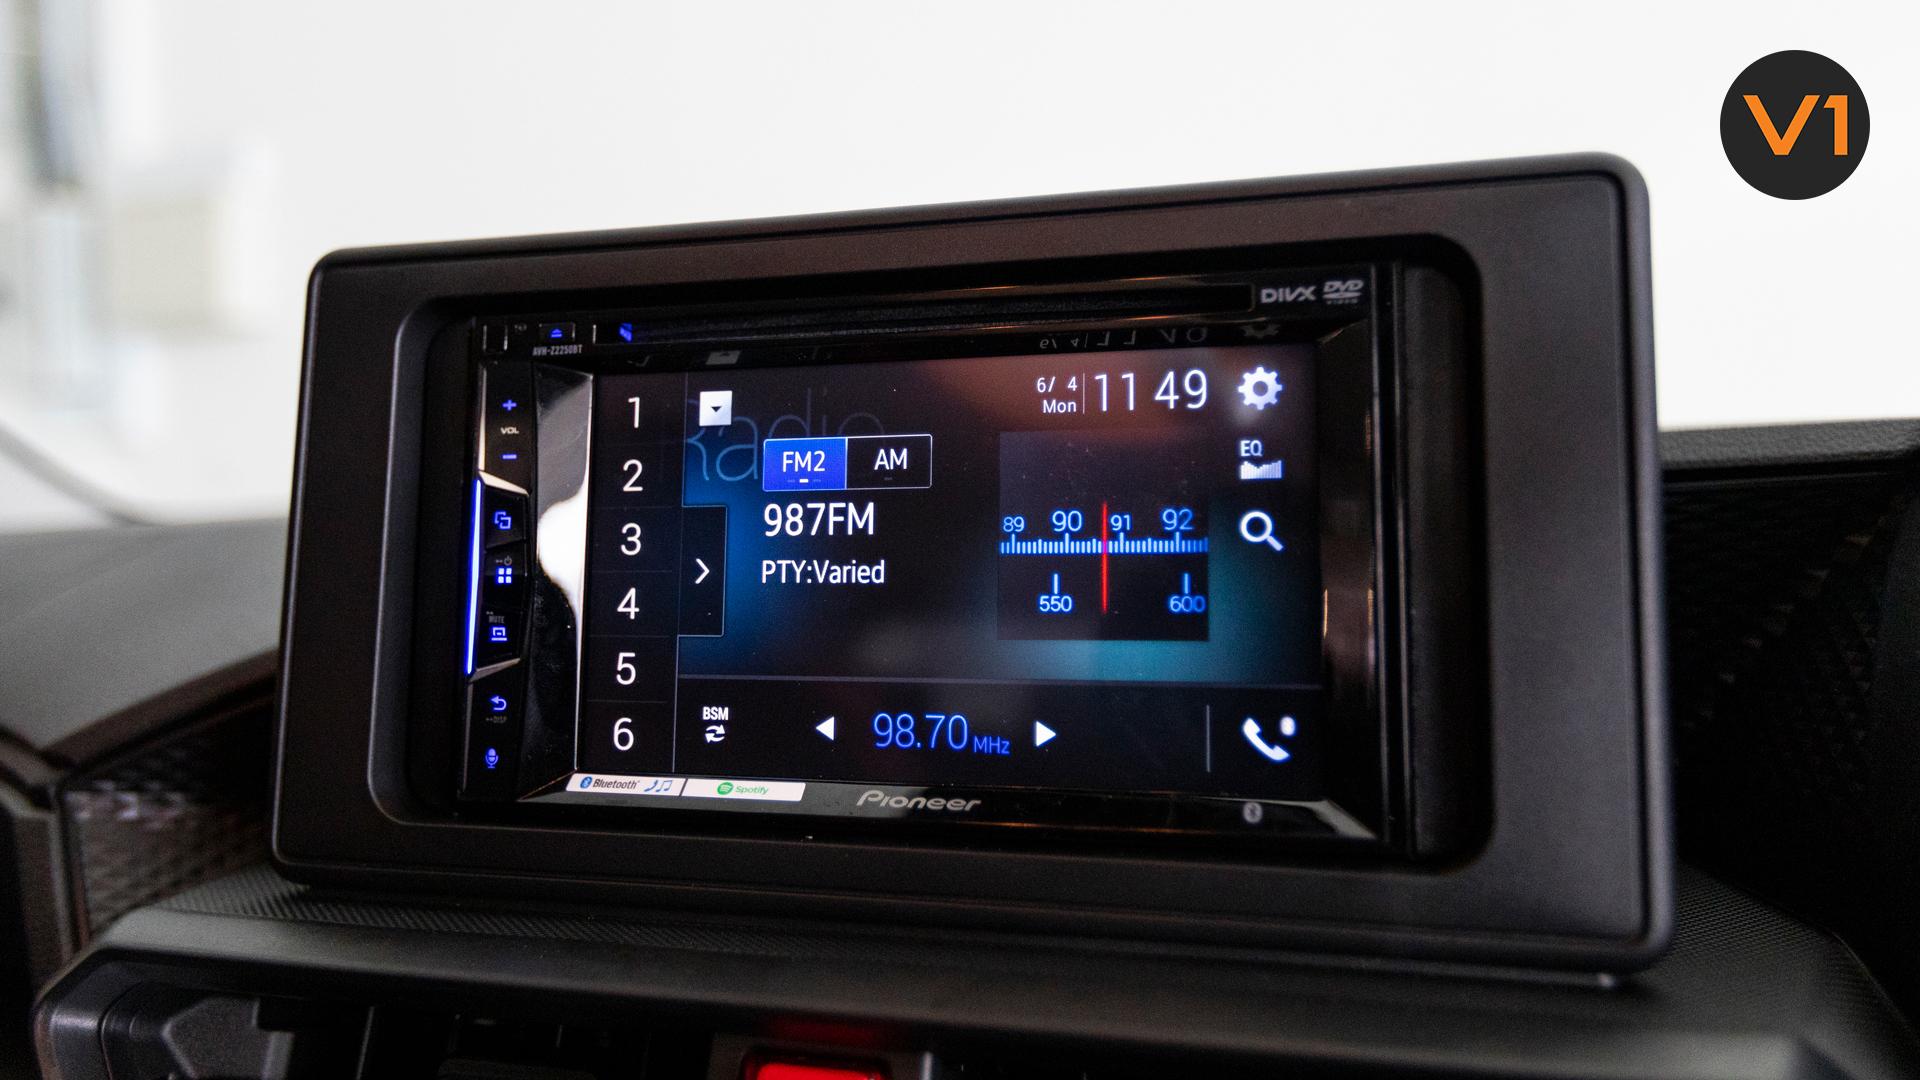 Toyota Raize 1.0 XS - Screen Display